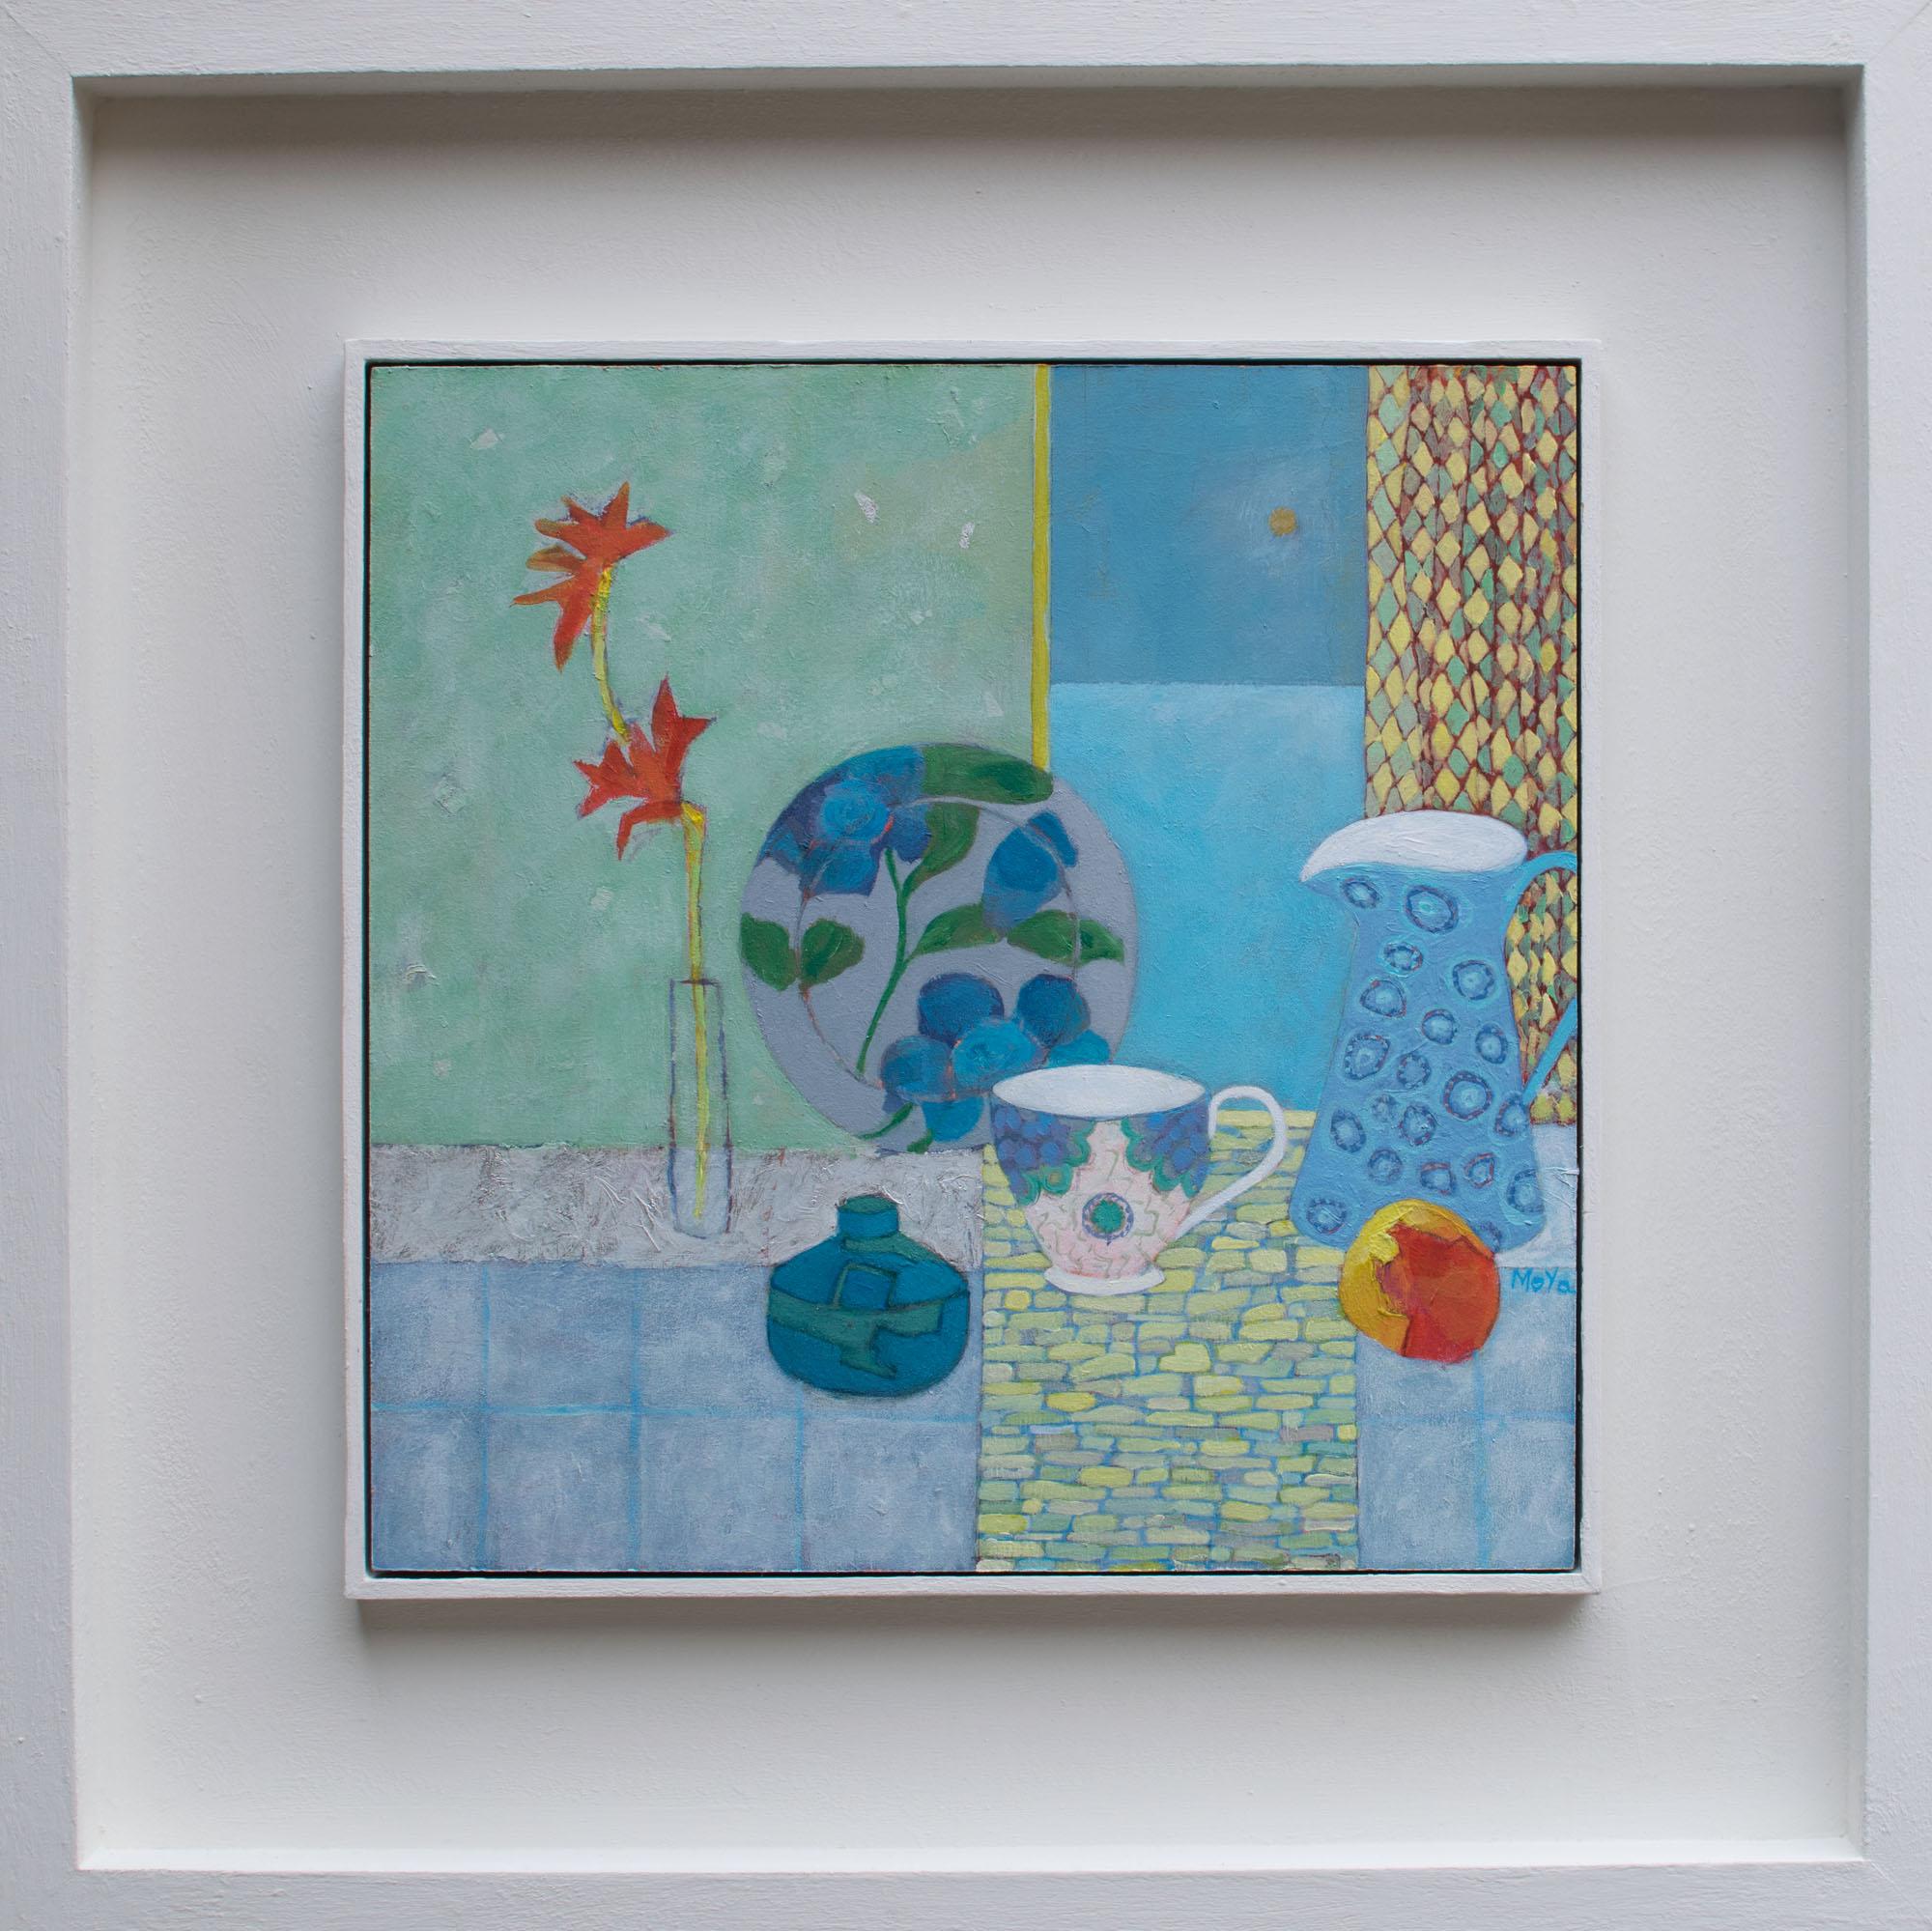 Still Life on Windowsill  acrylic on board  49 x 49 cm framed  £395